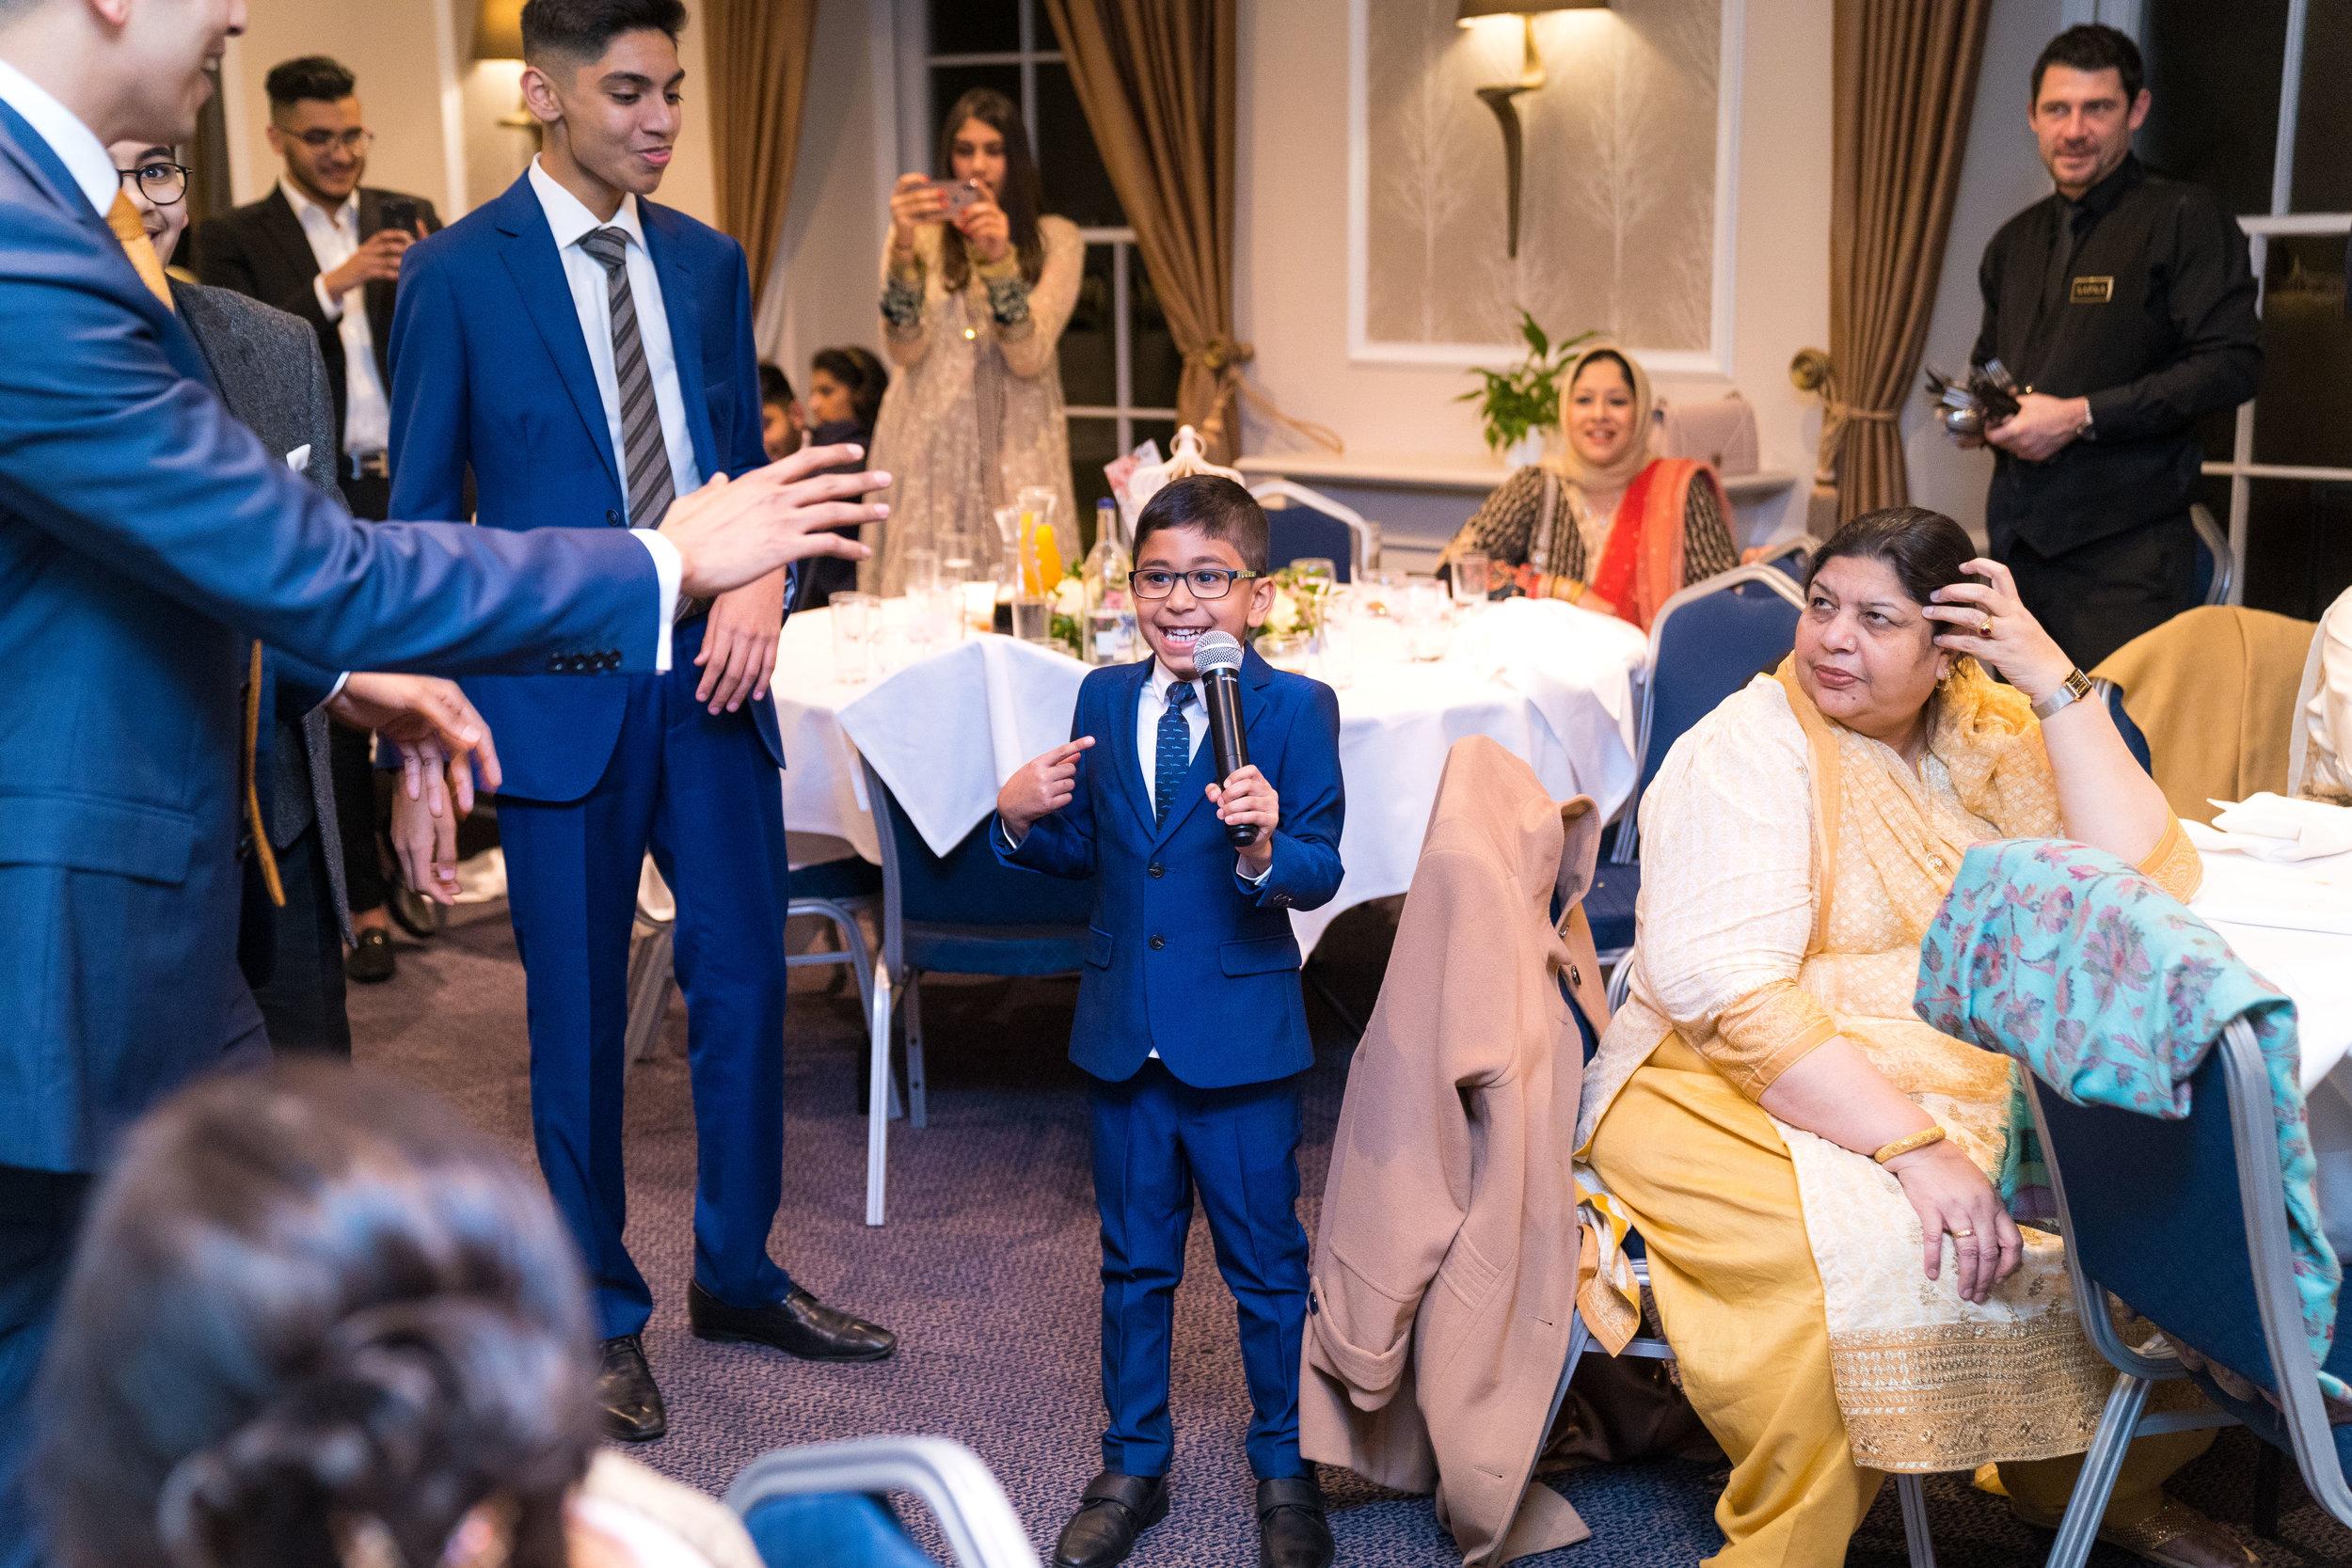 buckinghamshire-golf-club-winter-muslim-wedding-engagement-photography-videography-41